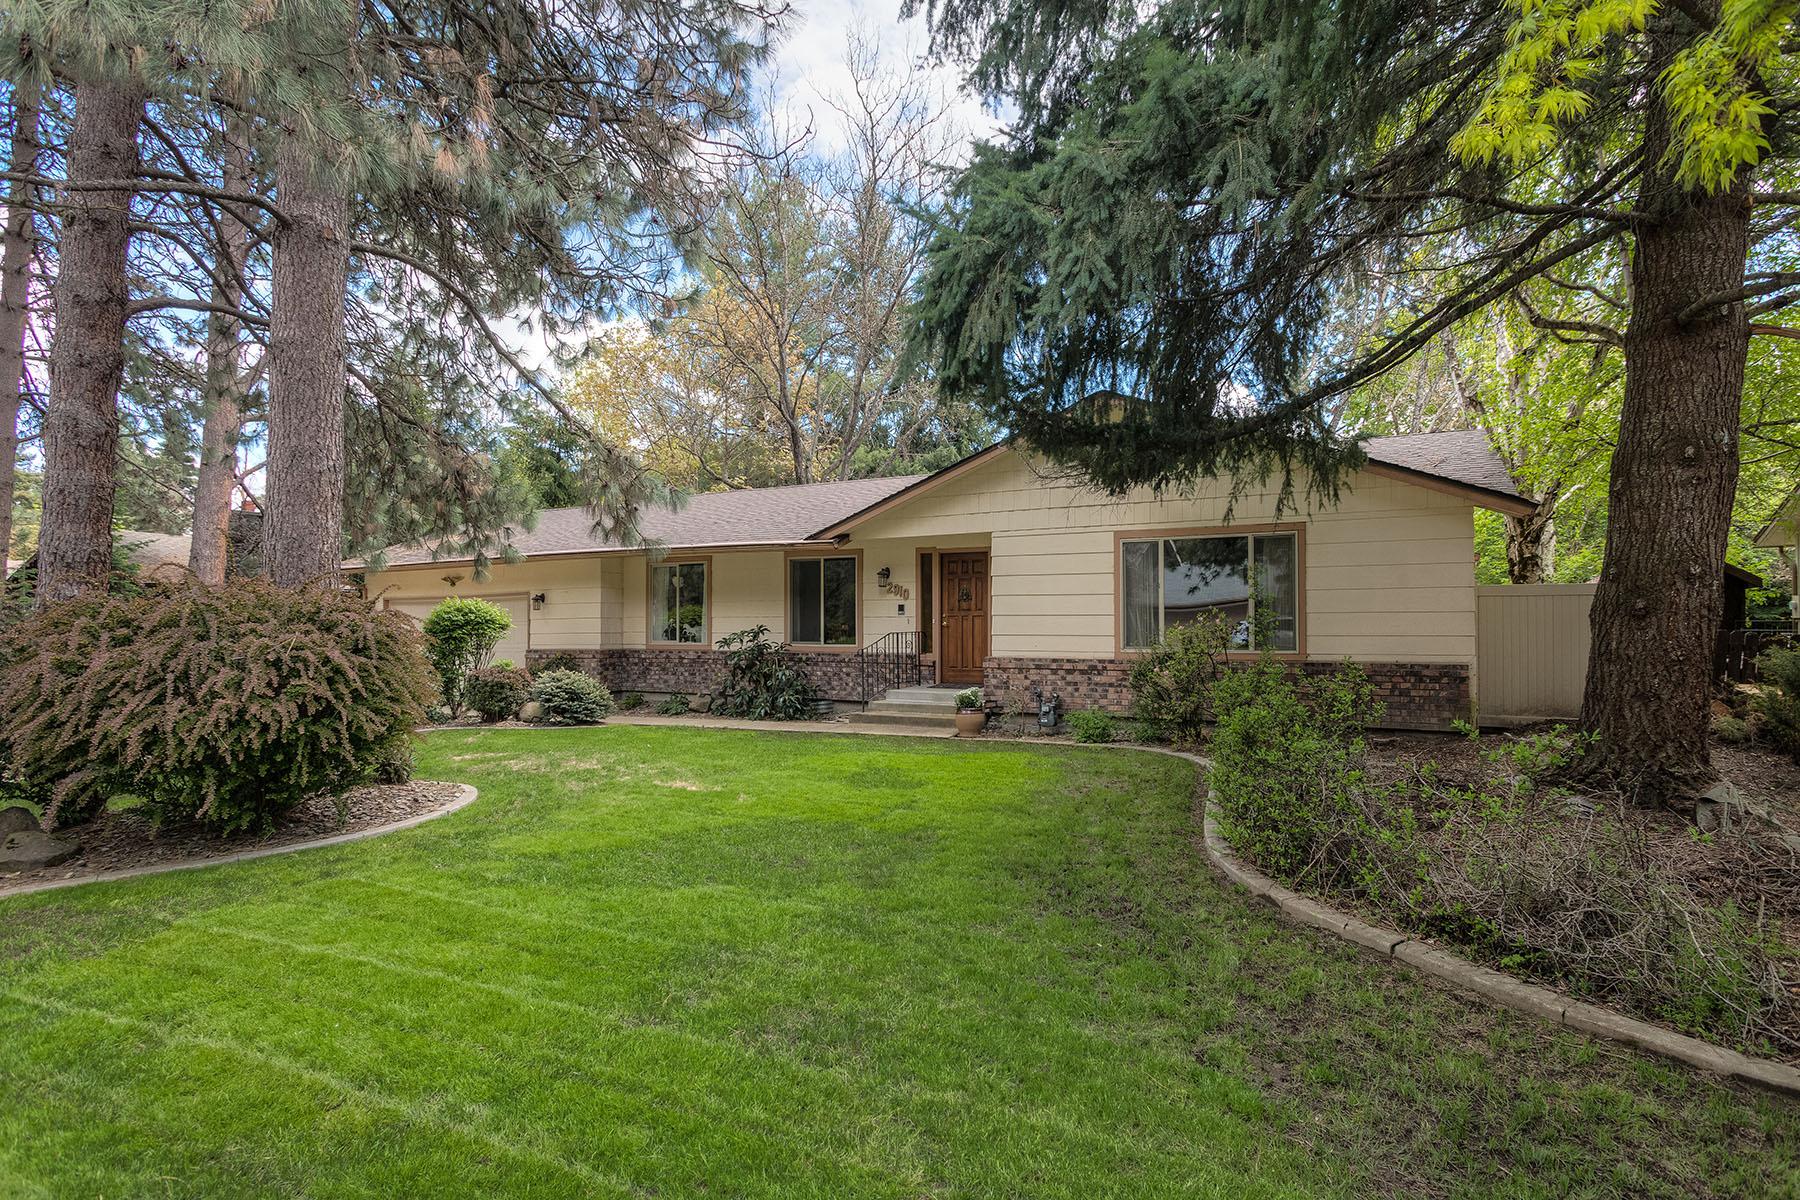 Single Family Home for Sale at Beautiful Fernan Area Home on .32 acres. 2910 E Fernan Ct Coeur D Alene, Idaho, 83814 United States